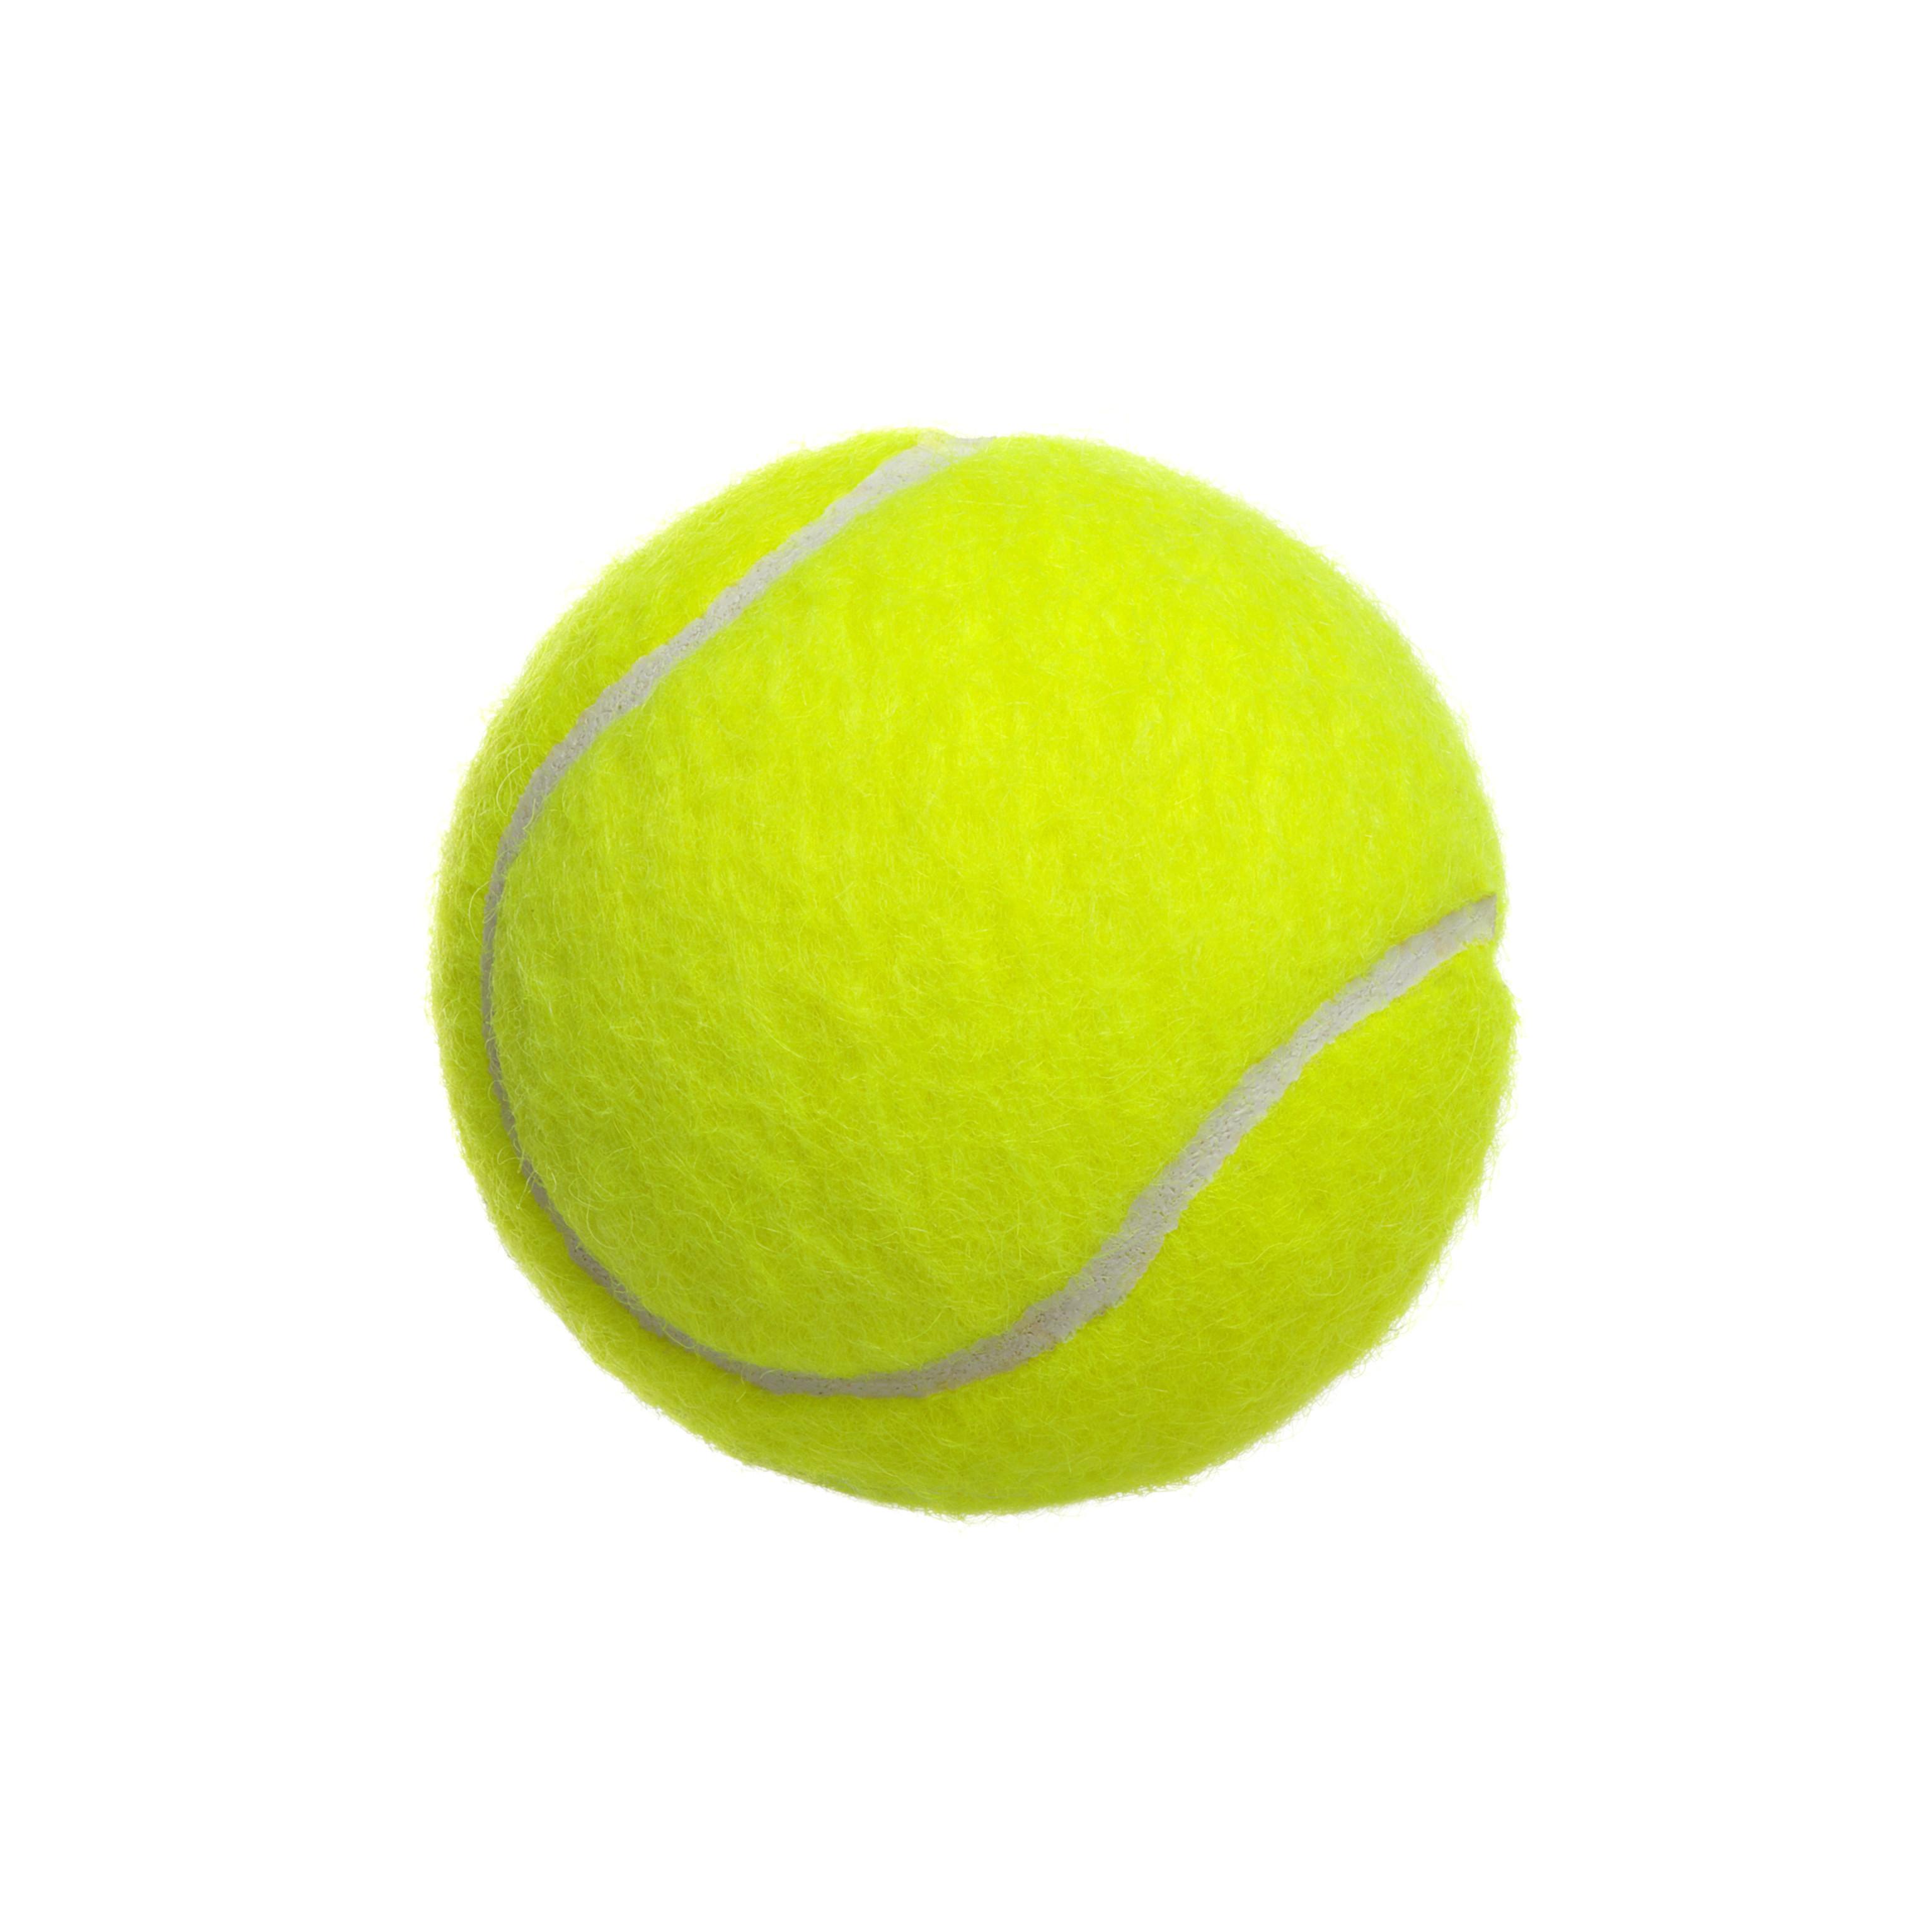 PAYG Dormansland Friday Tennis 5-8 years